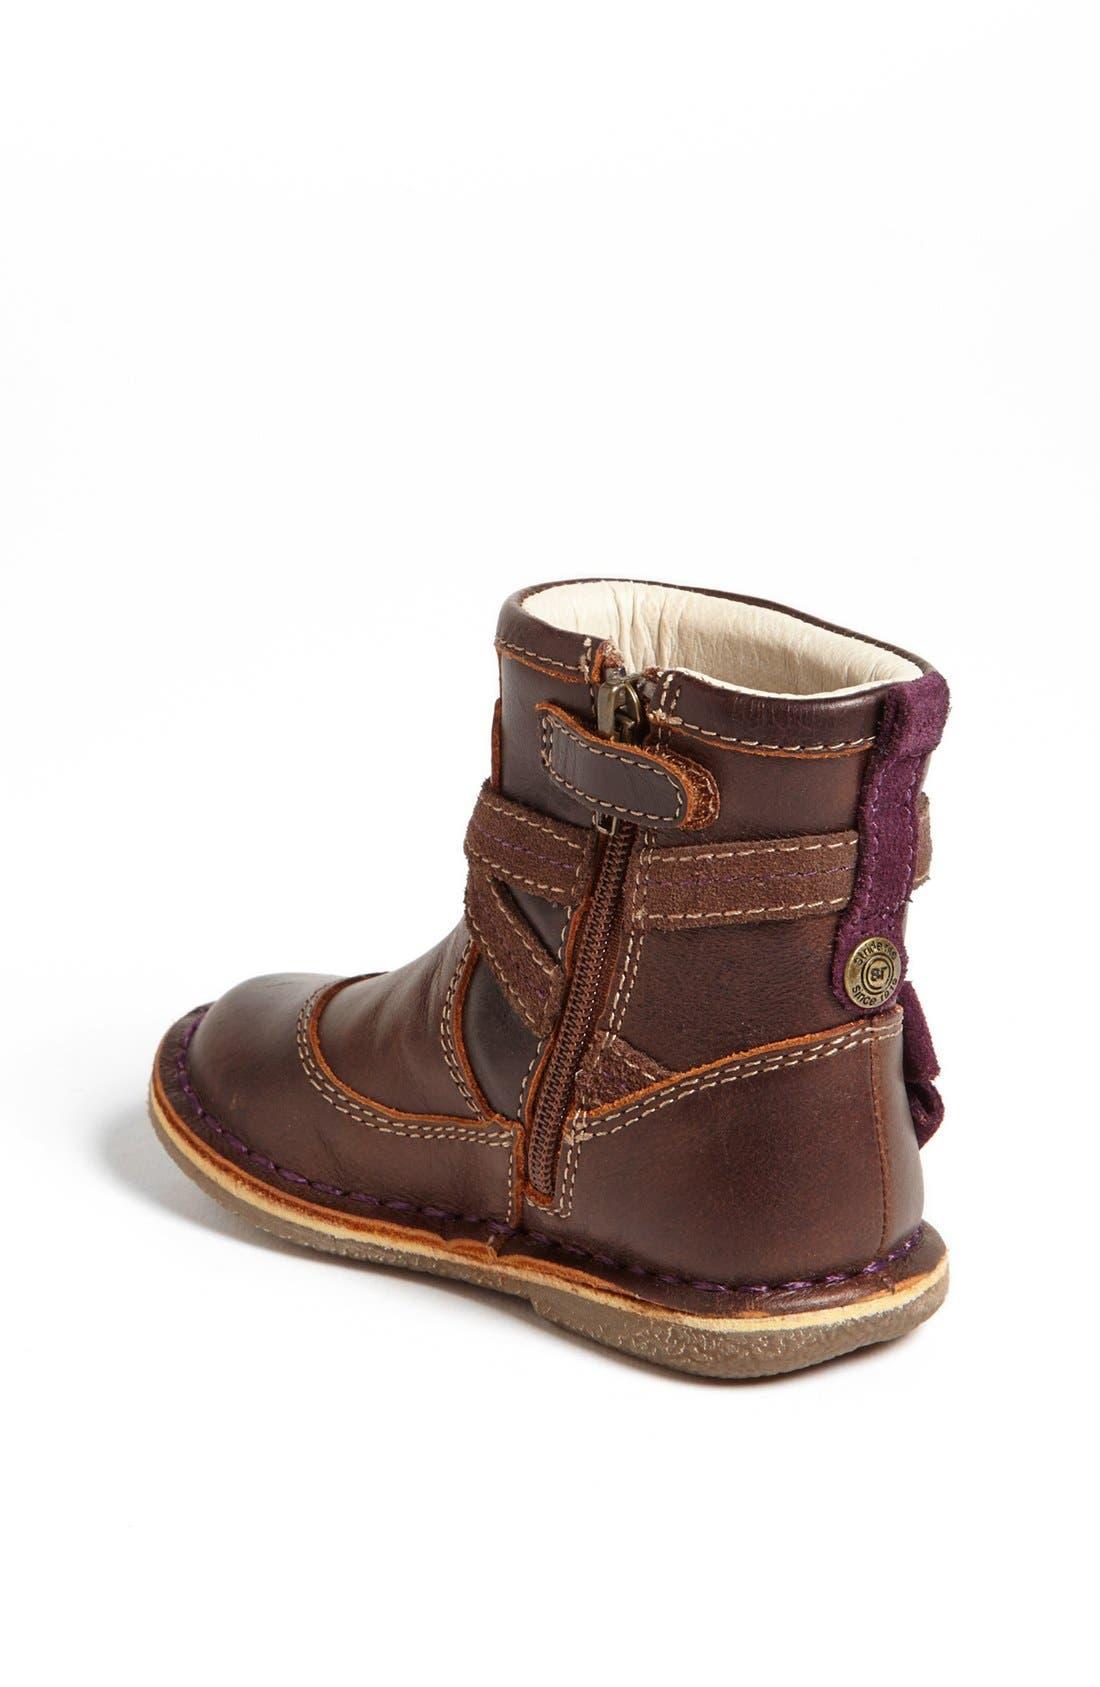 Alternate Image 2  - Stride Rite 'Medallion Collection - Roslin' Boot (Baby, Walker & Toddler)